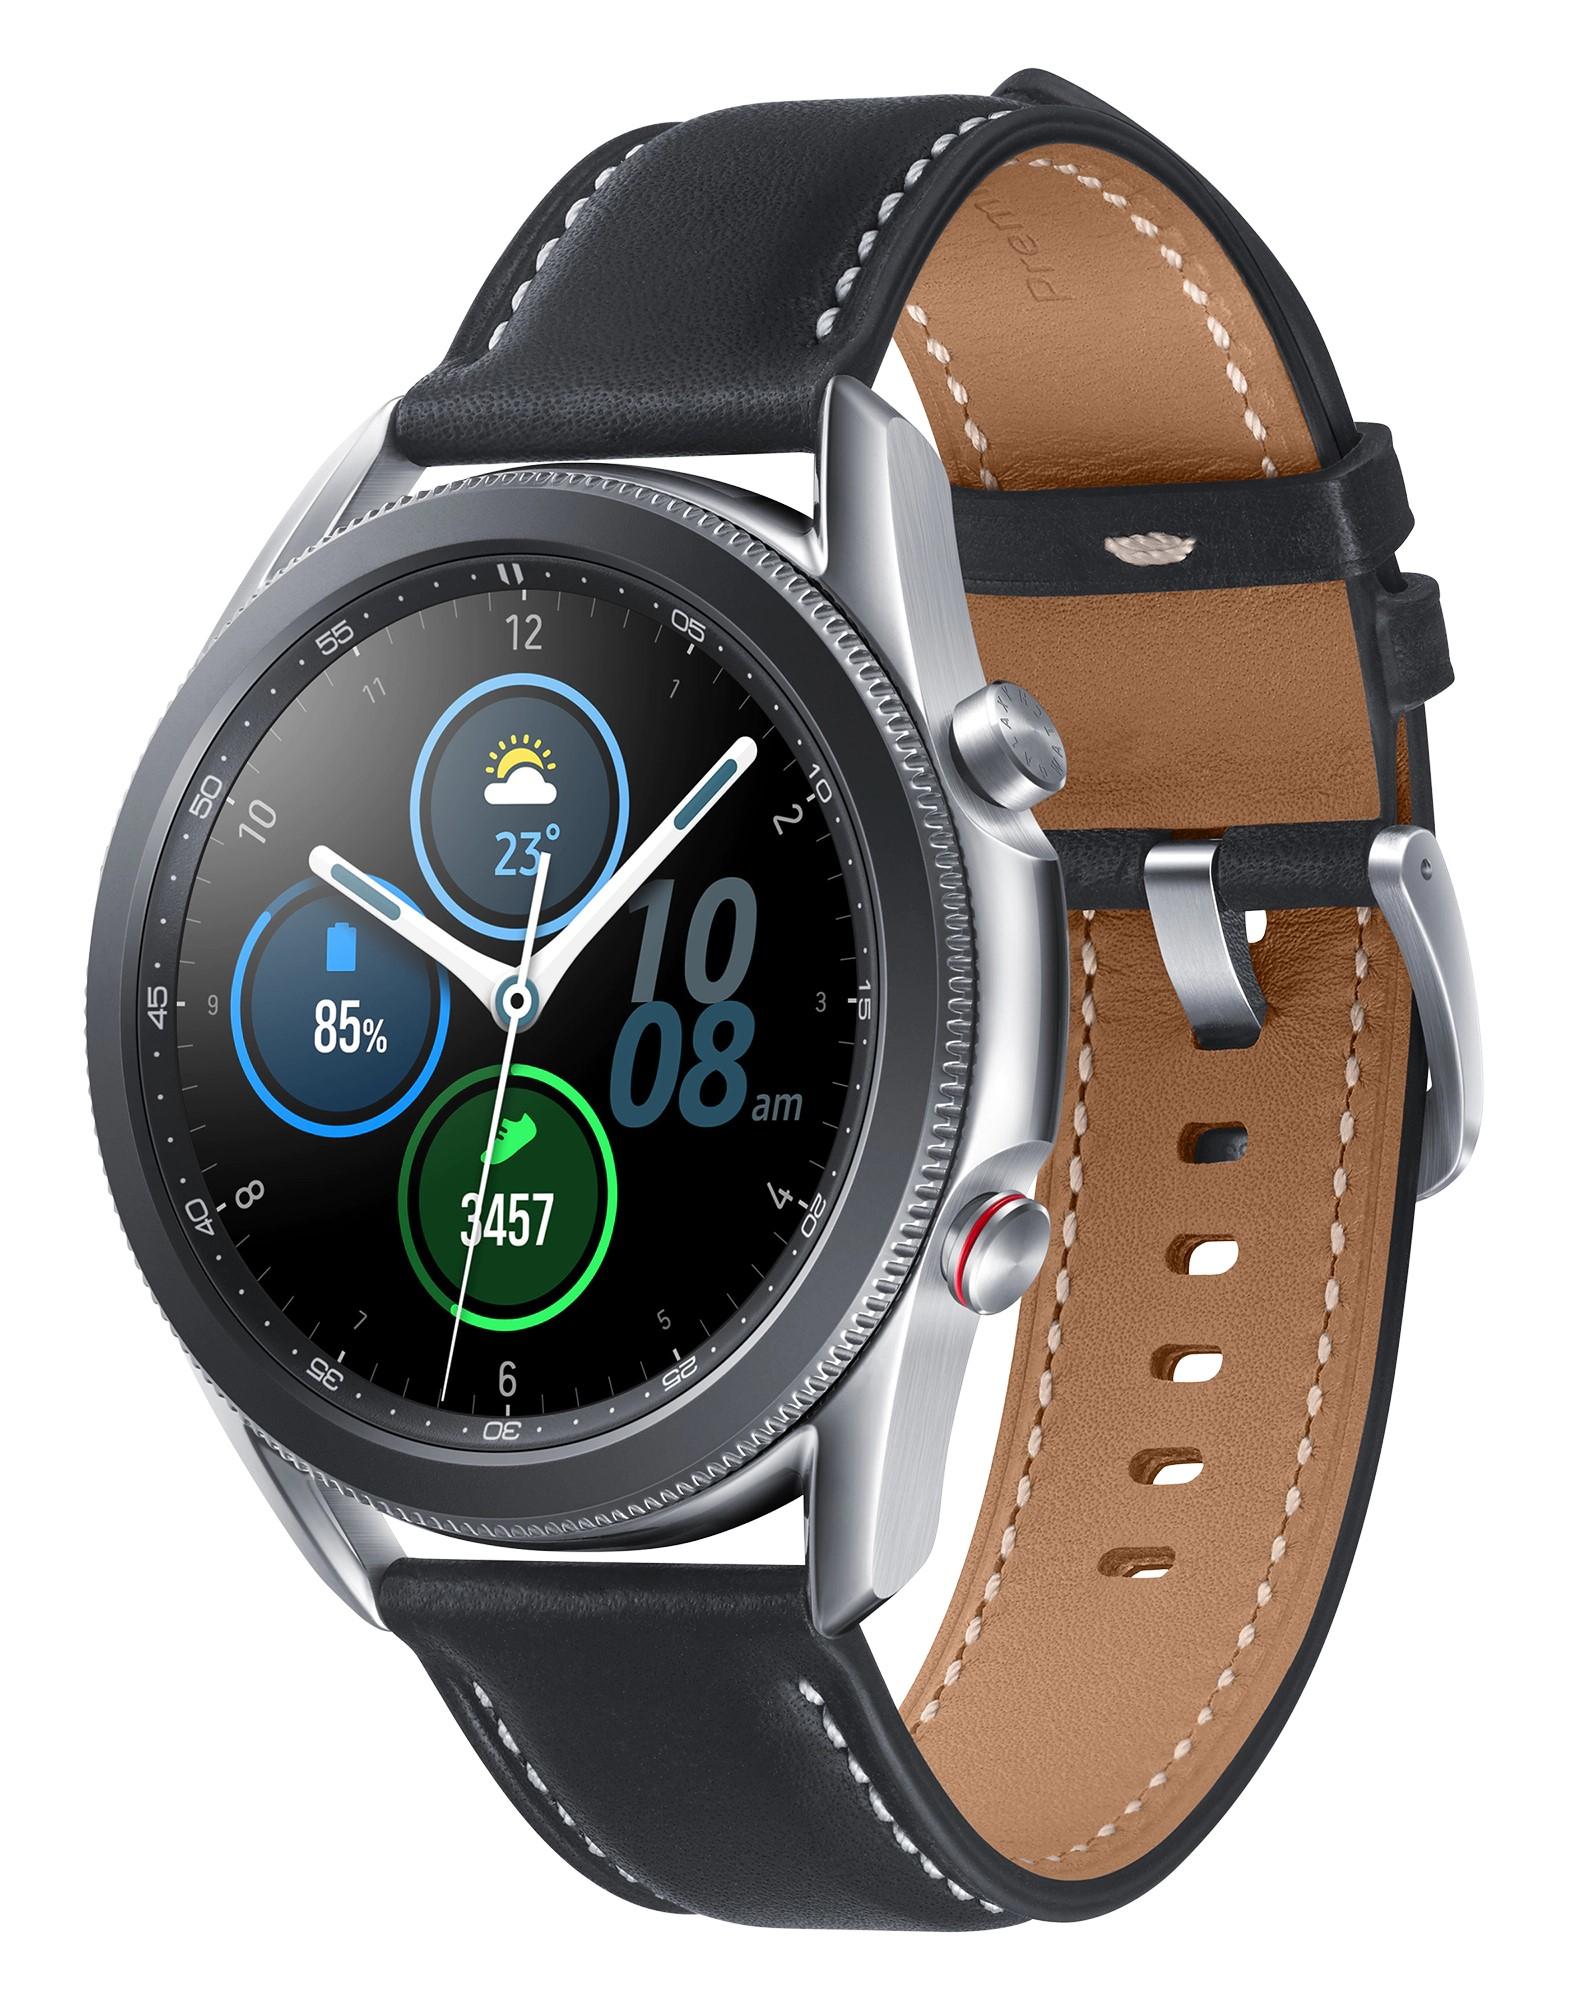 Samsung Galaxy Watch3 smartwatch SAMOLED 3.56 cm (1.4